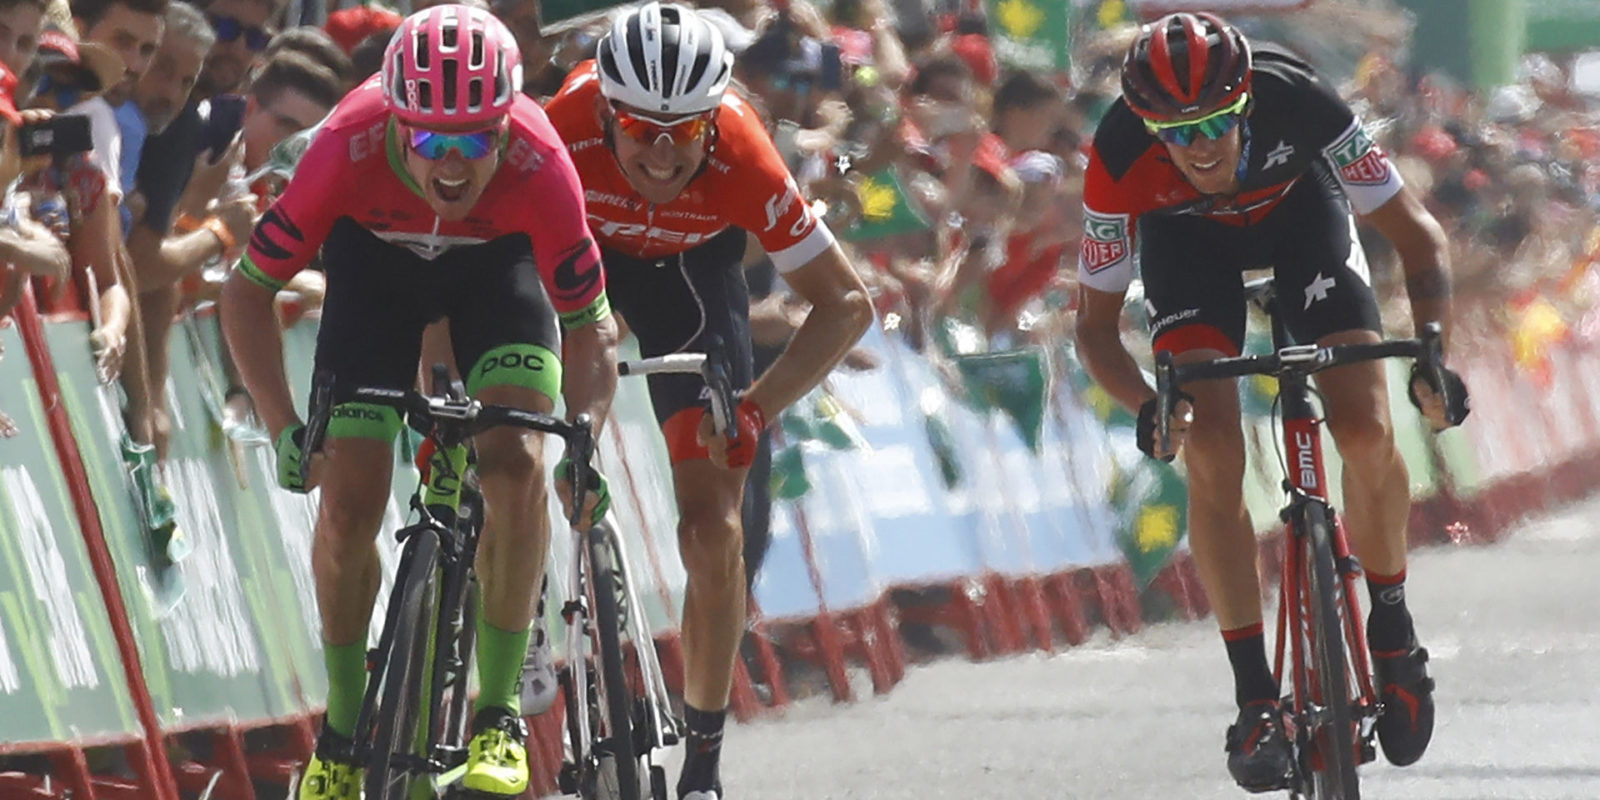 https://racing.trekbikes.com/sport/road/2018/bauke-mollema-close-second-in-la-vuelta-stage-five/